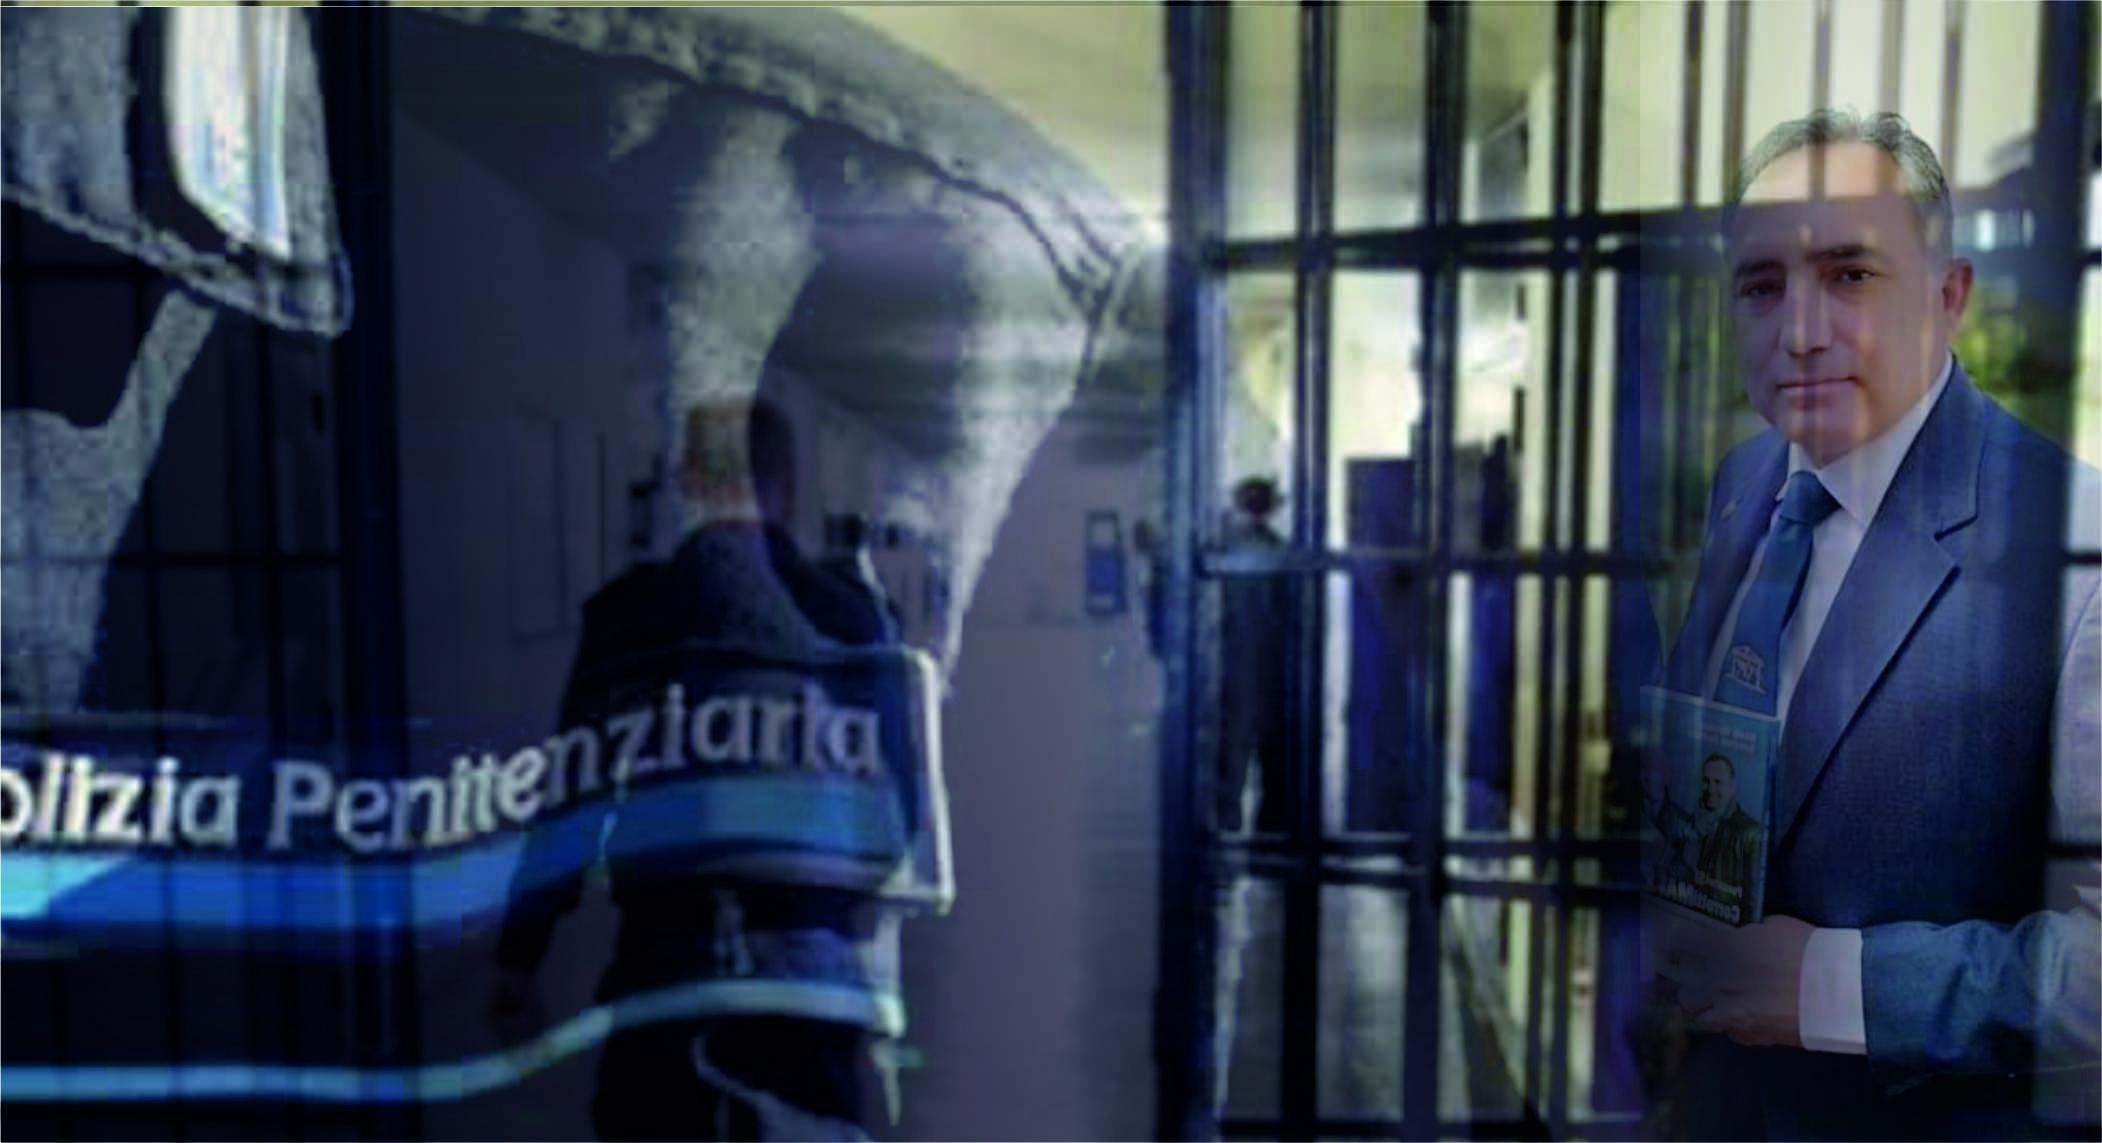 sardisco- polizia penitenziaria